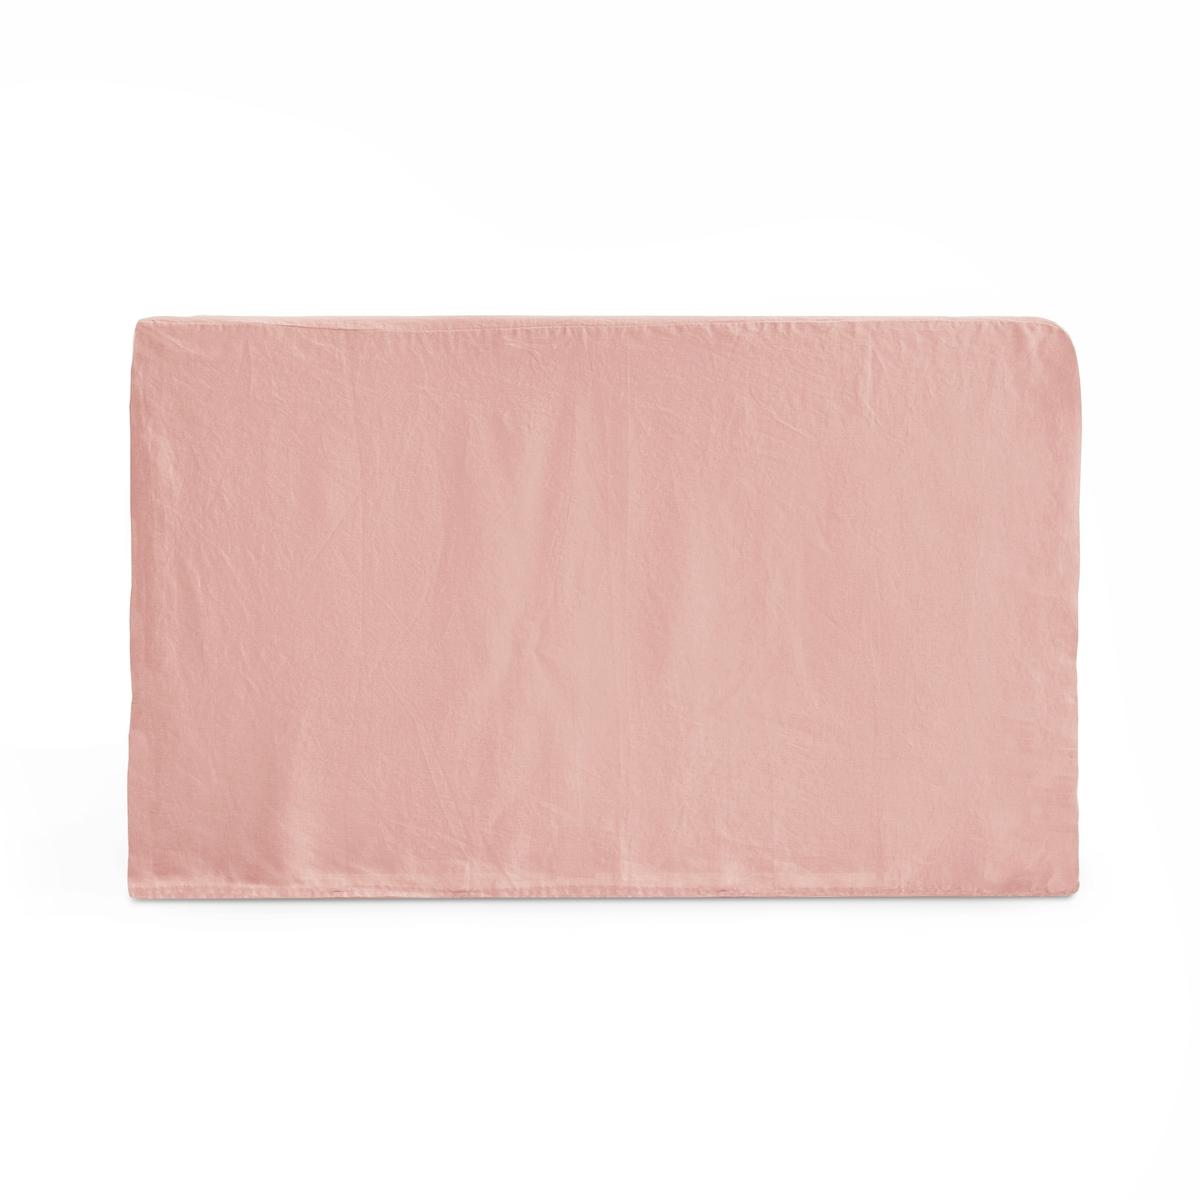 Чехол LaRedoute На изголовье кровати из осветленного льна ABELLA 90 x 85 см розовый